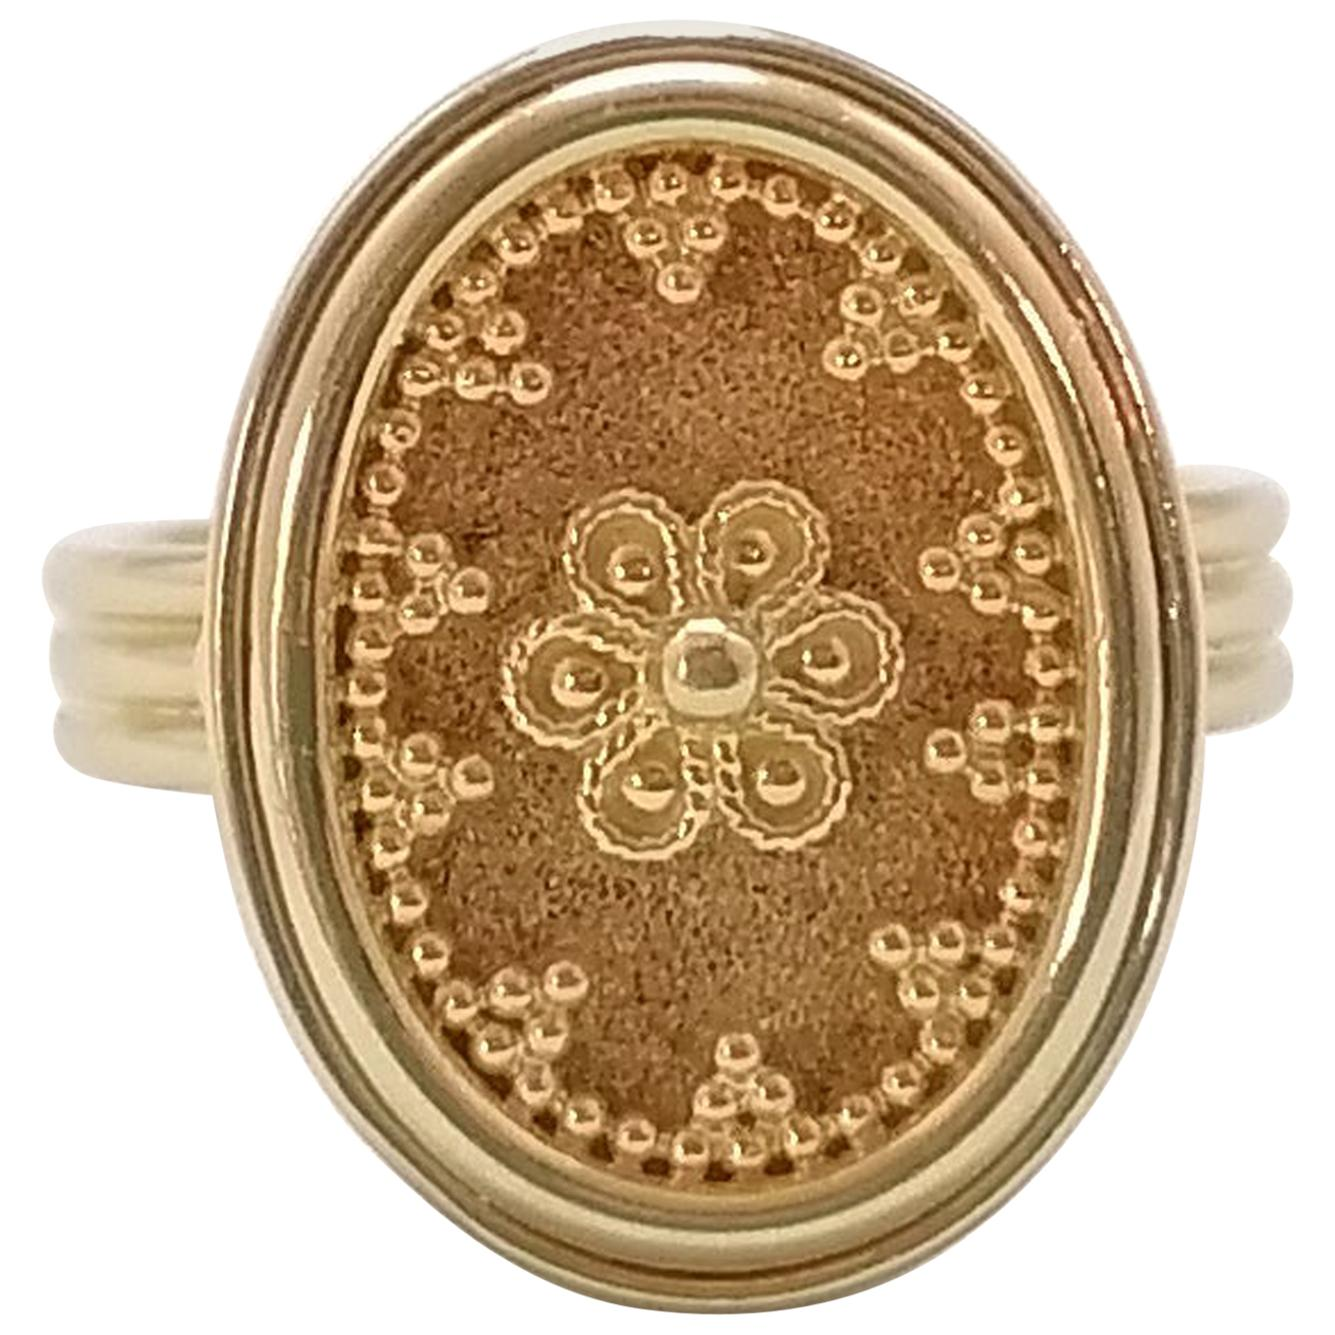 Georgios Collections 18 Karat Yellow Gold Granulated No Stone Band Ring